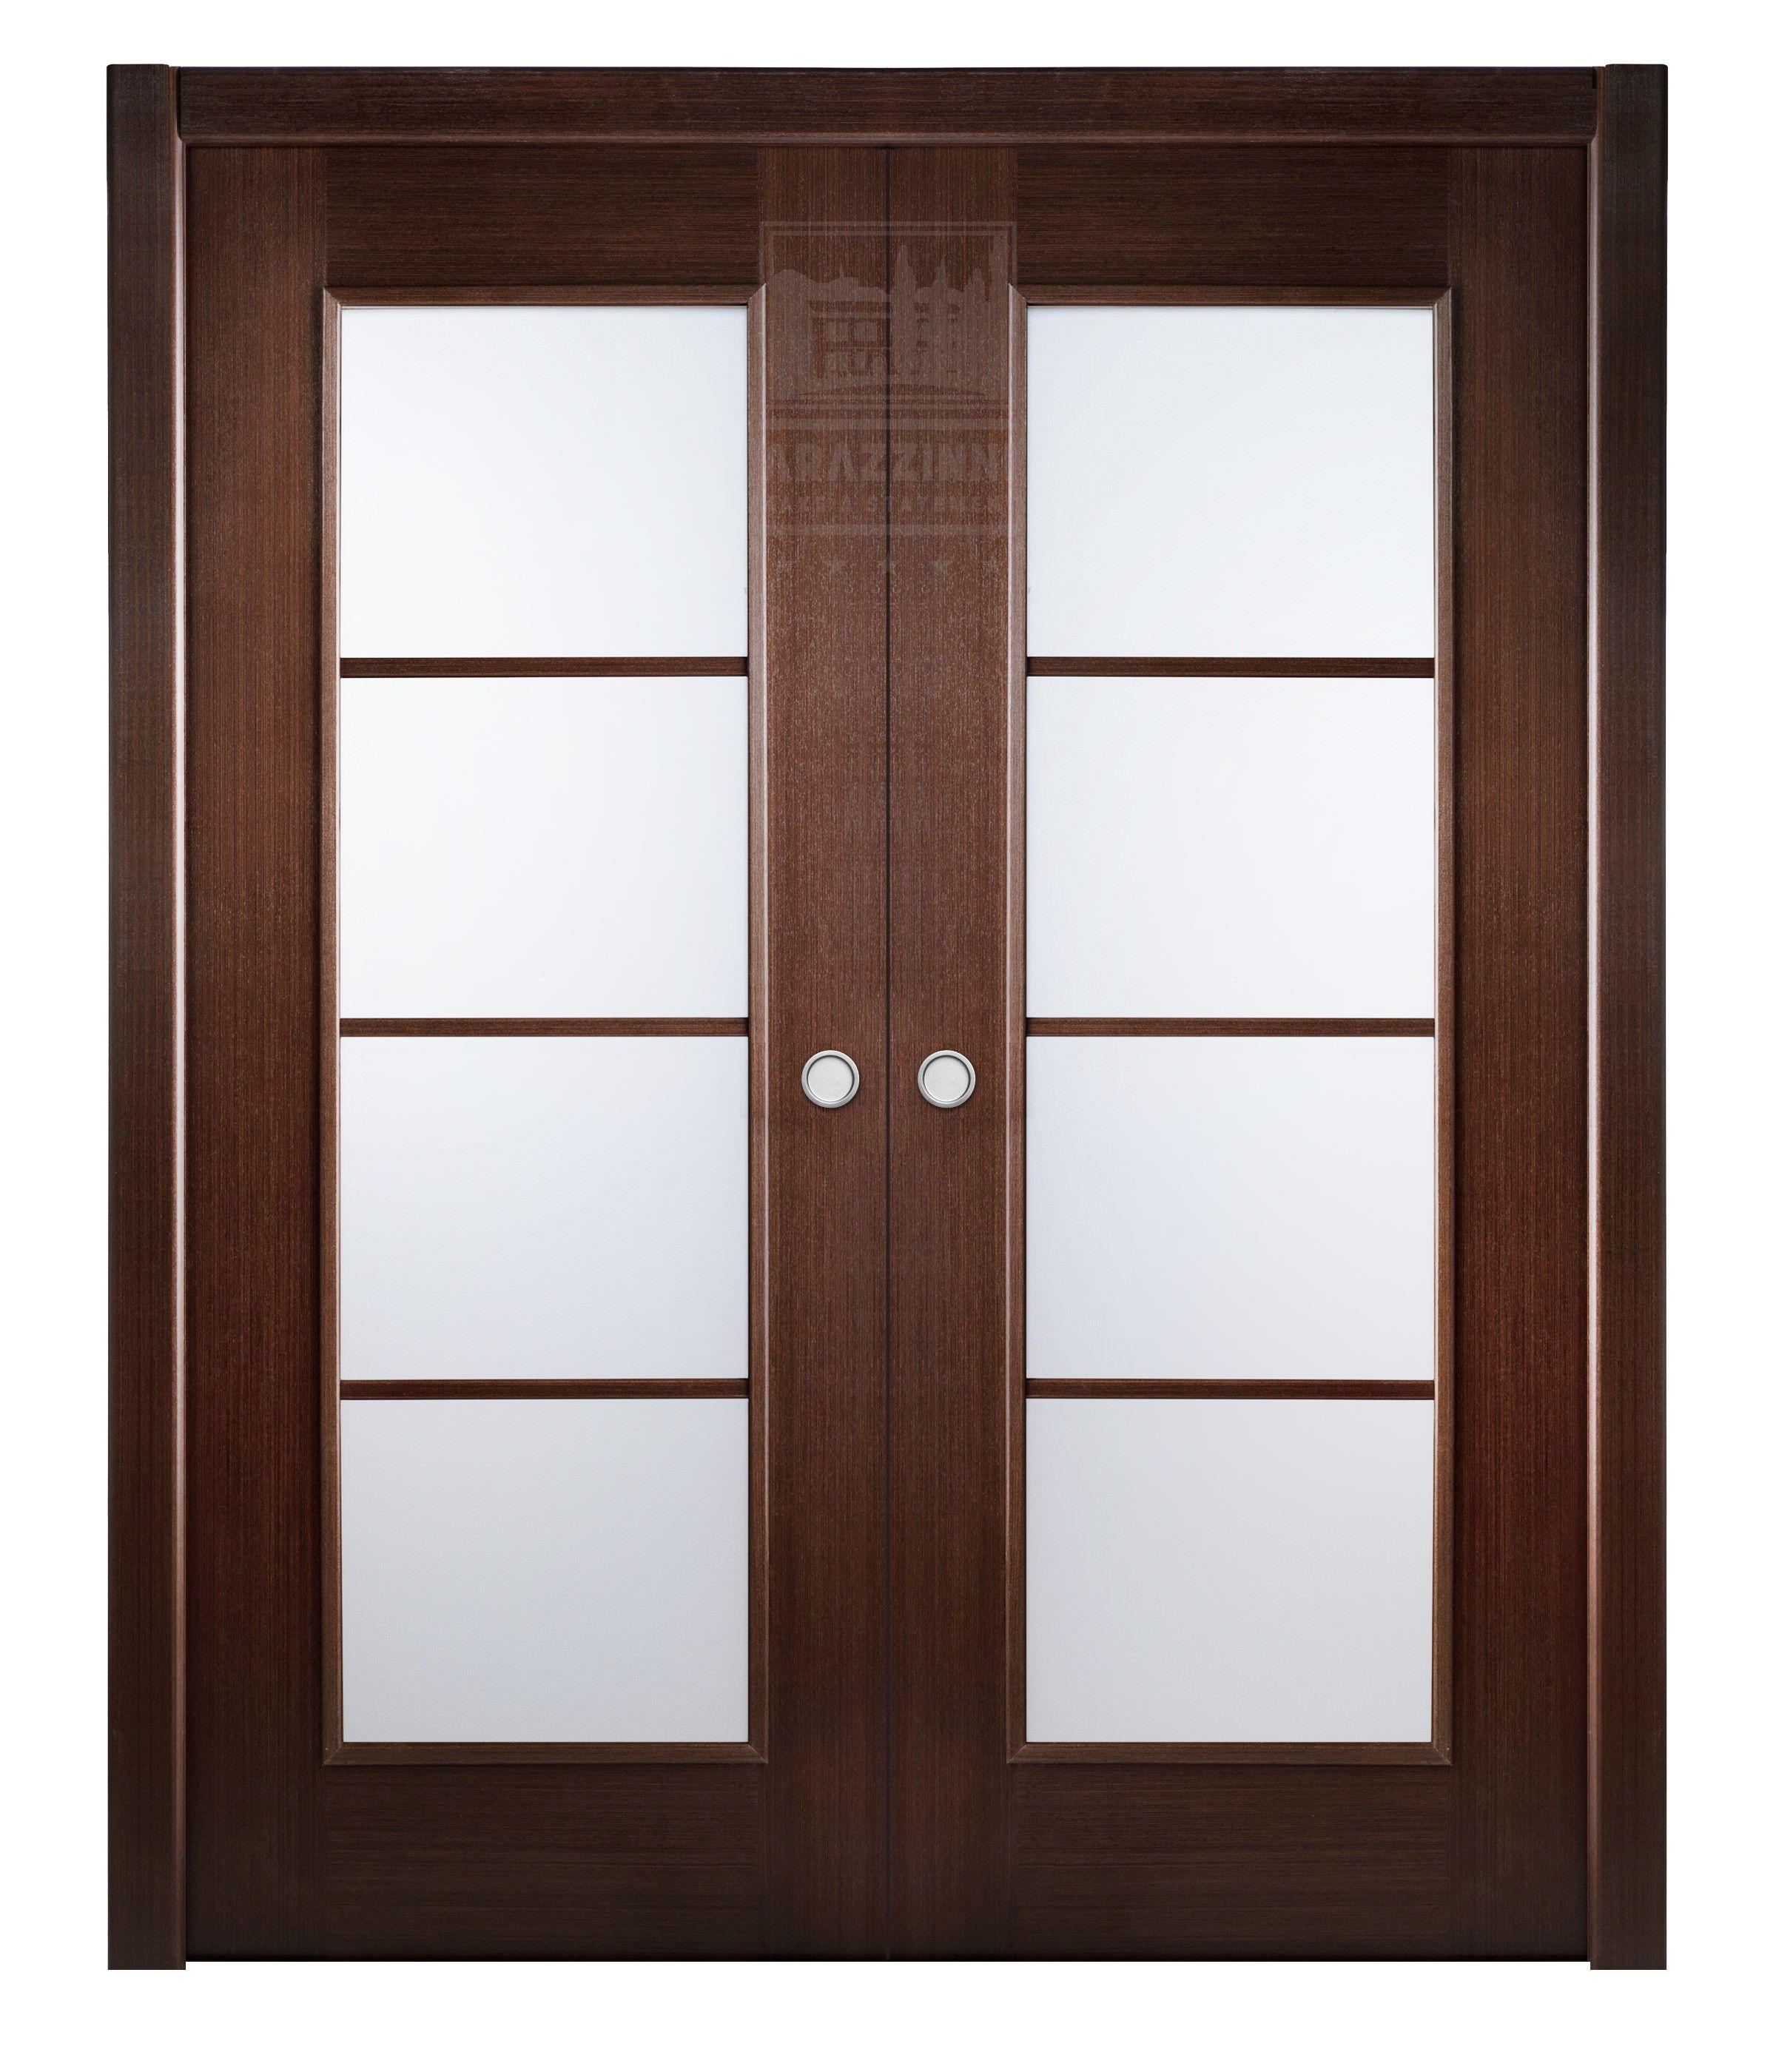 Arazzinni modern lux interior double pocket door wenge double arazzinni modern lux interior double pocket door wenge planetlyrics Images